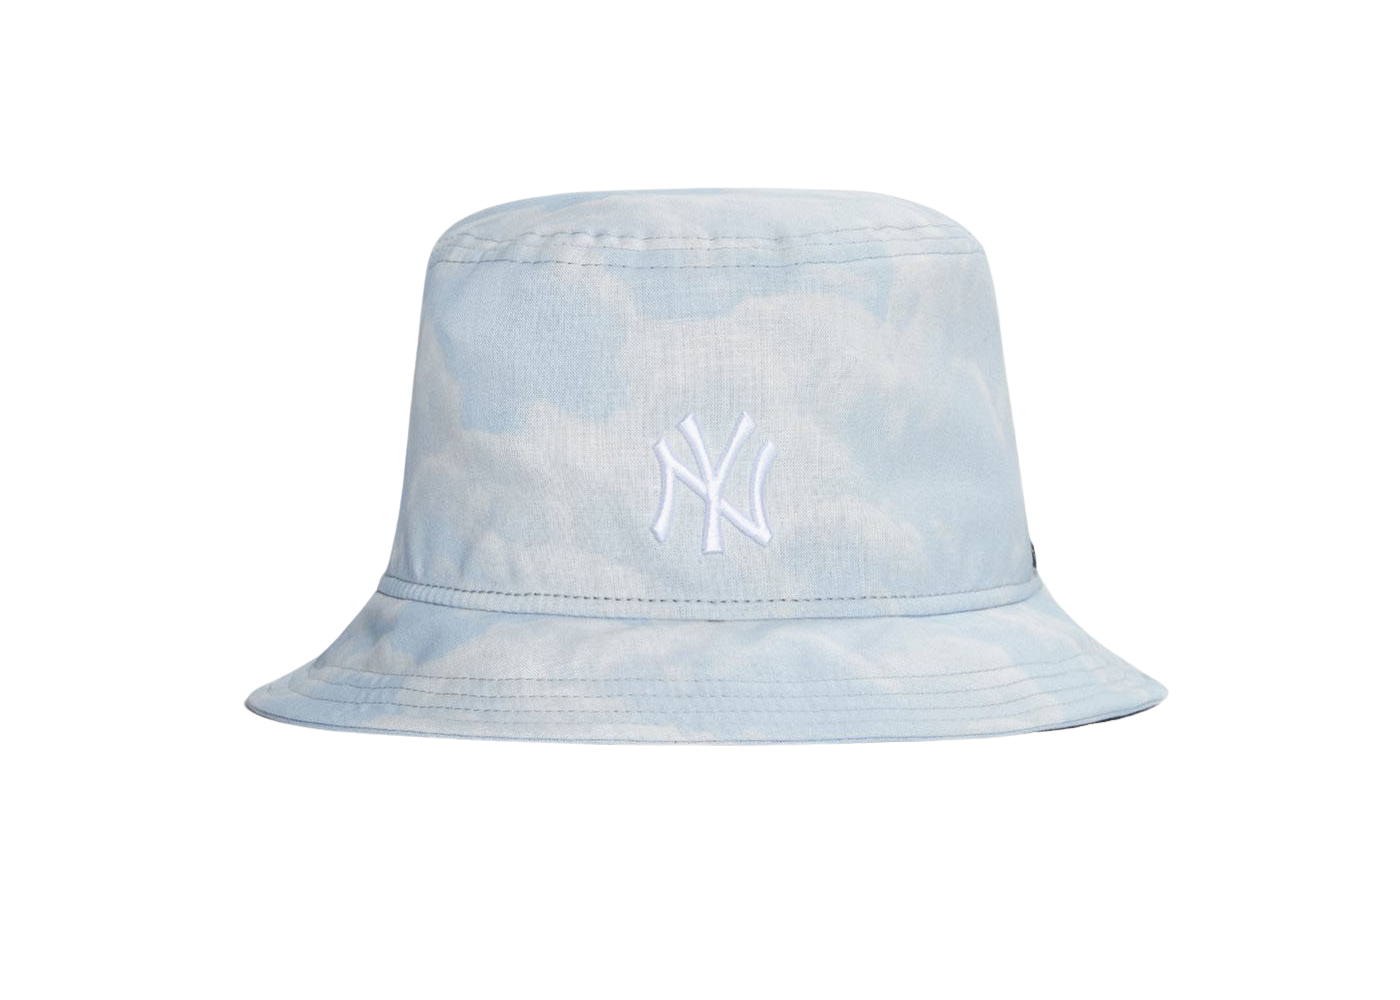 Kith for New Era Cloud Sky Bucket Hat Summitの写真